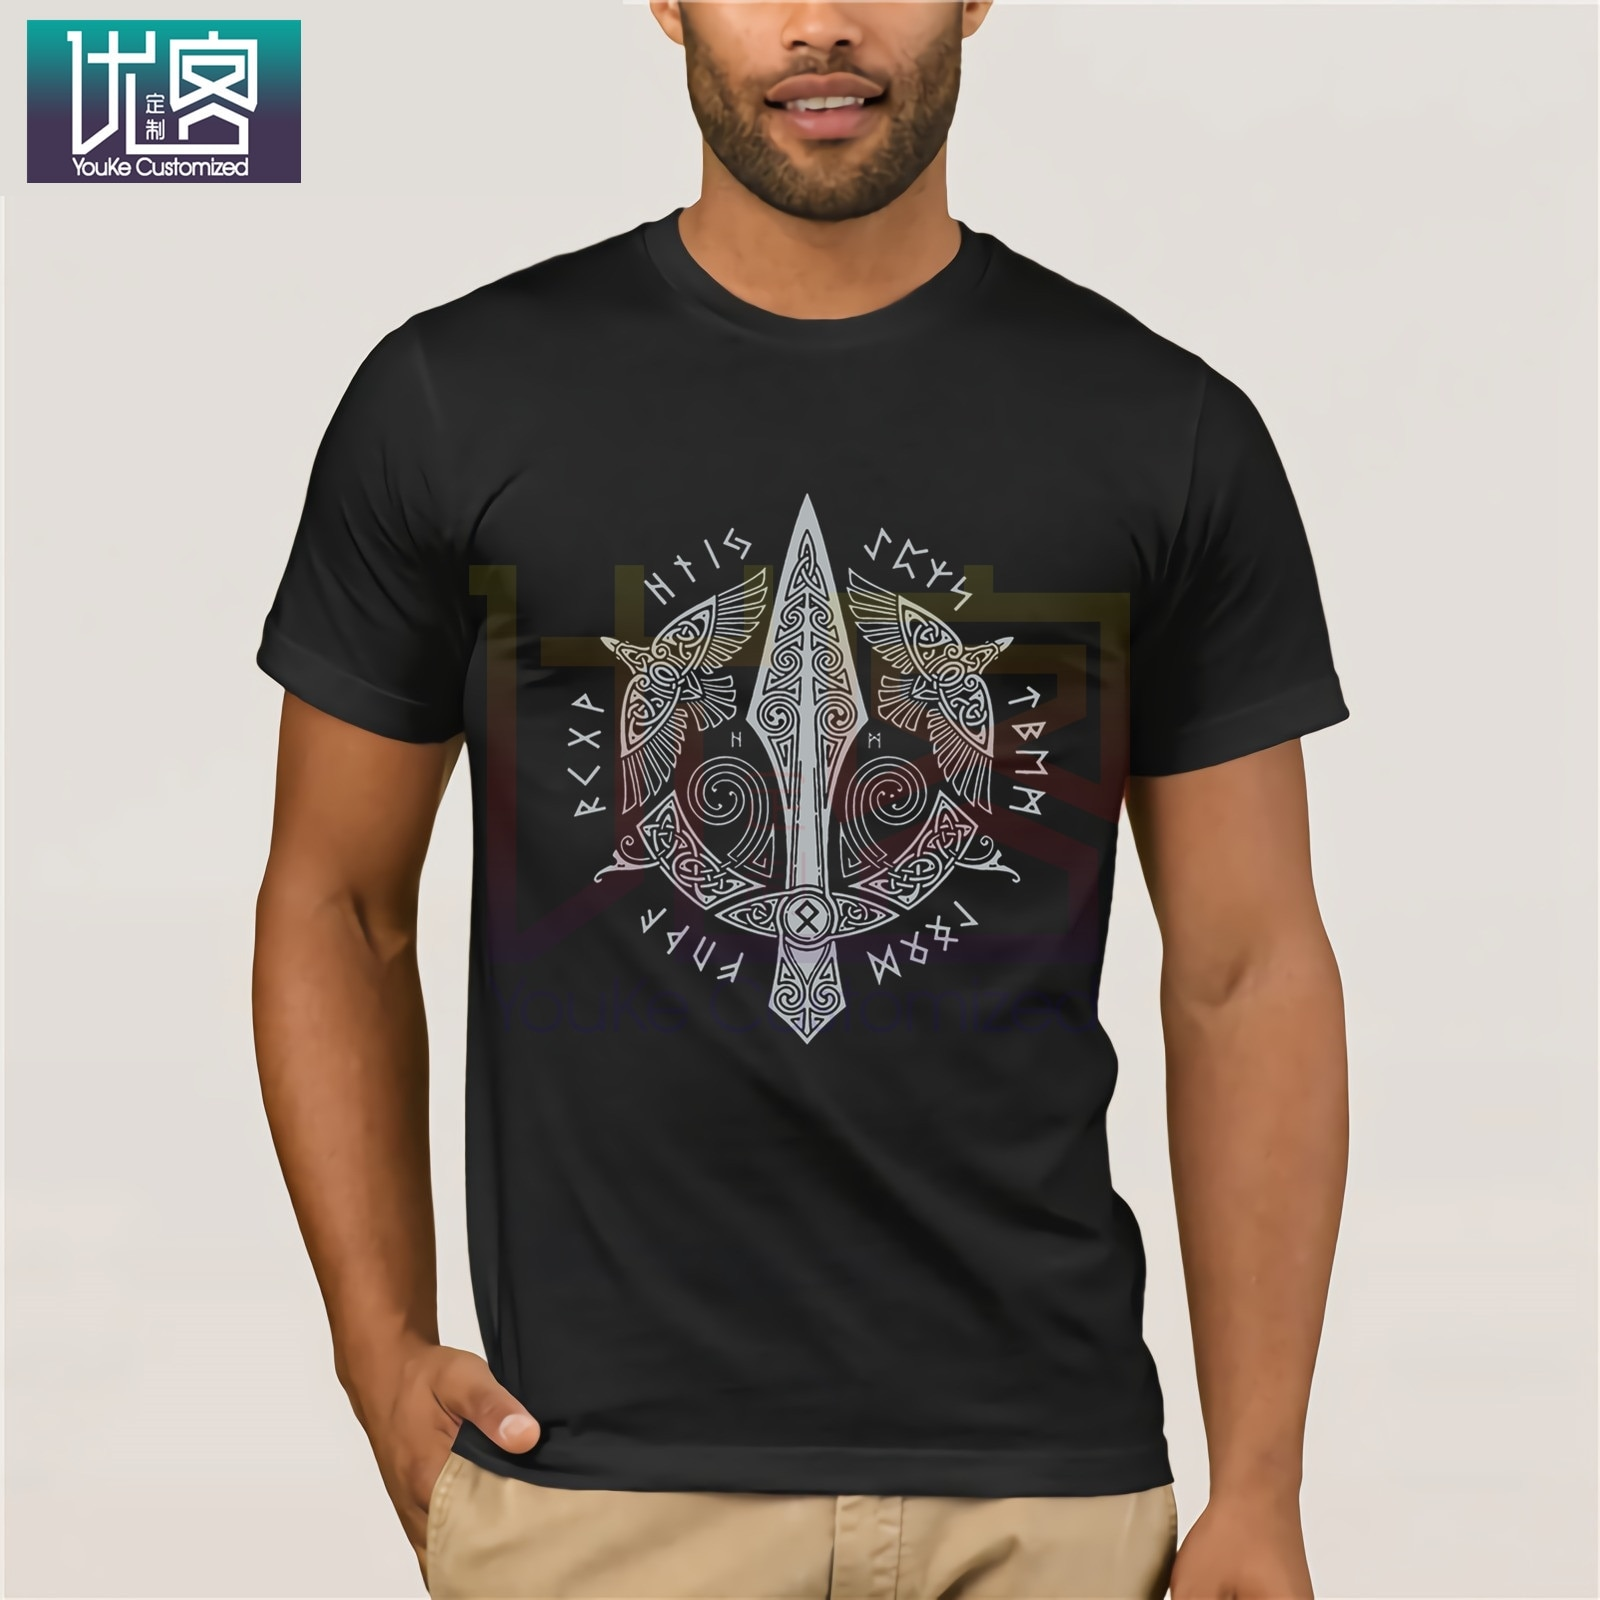 Gungnir Vikings Men 100% Cotton Men Slim Fit Short Sleeve T-Shirts Printed Men Cool Odin T-Shirts Plus Size for Men Tops